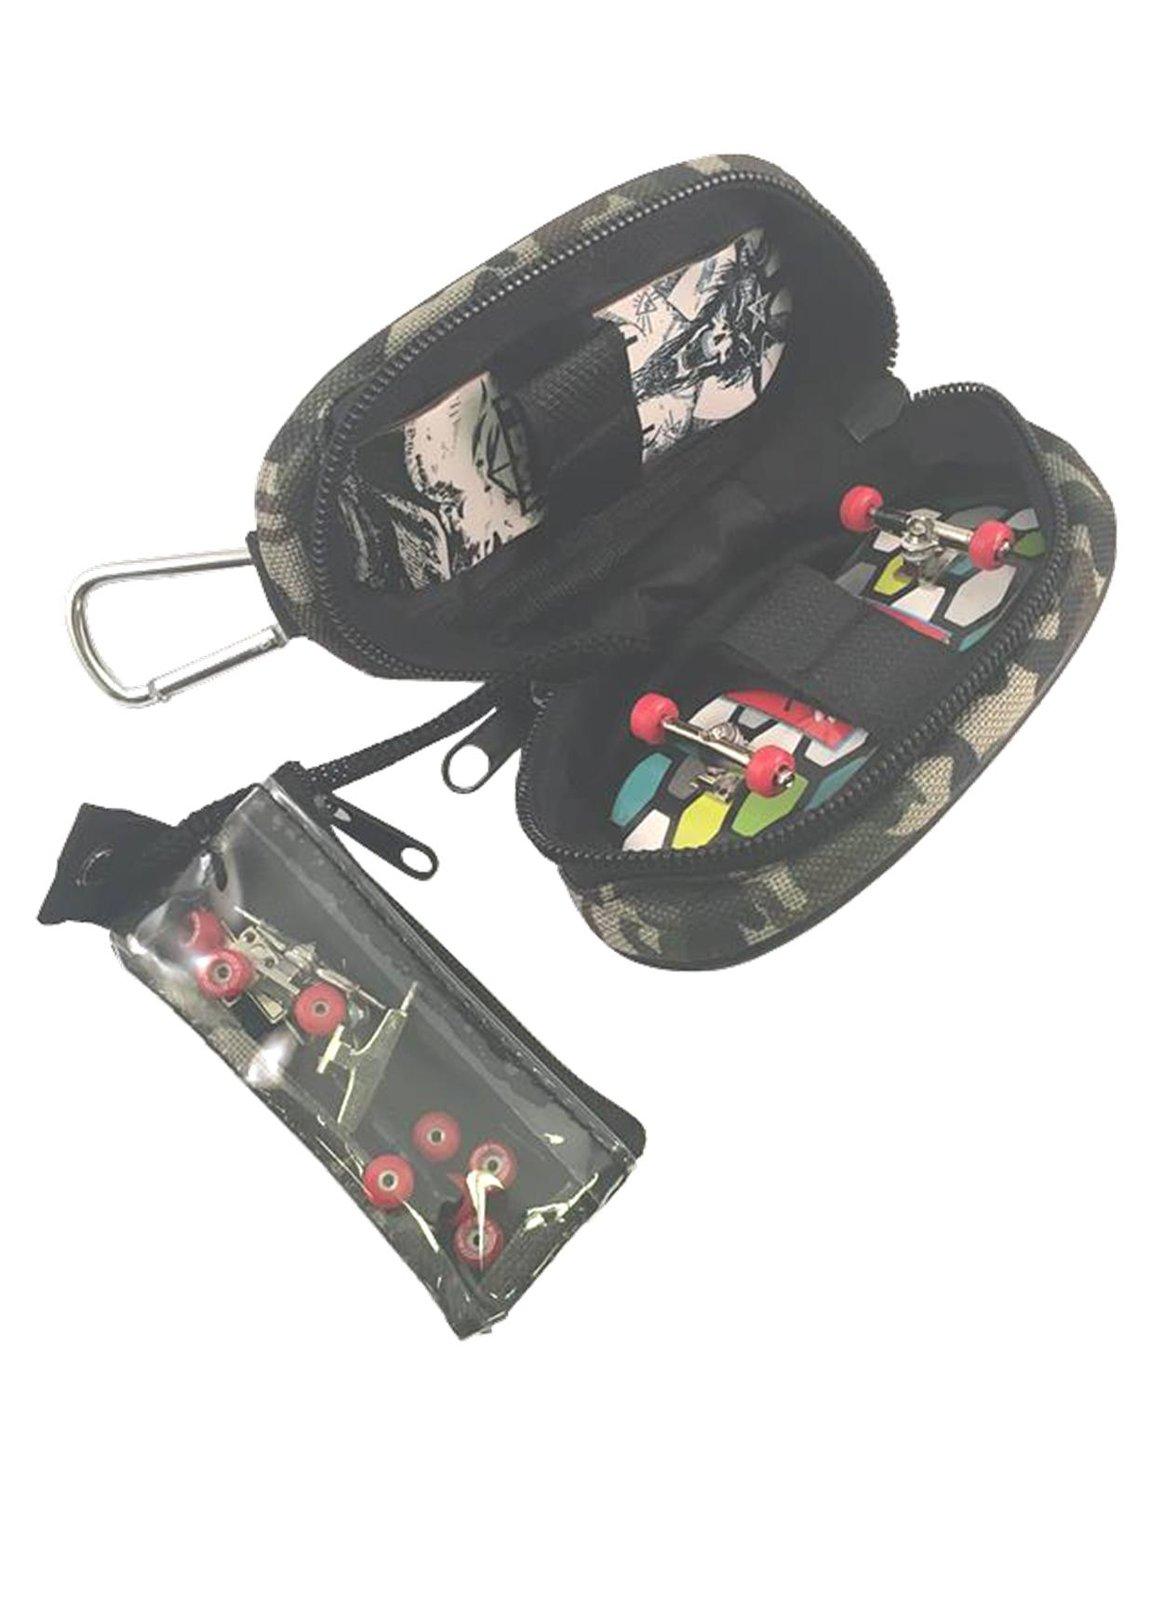 Fbuk Carry Case Gear Bag Camo Fingerboards Uk Shop